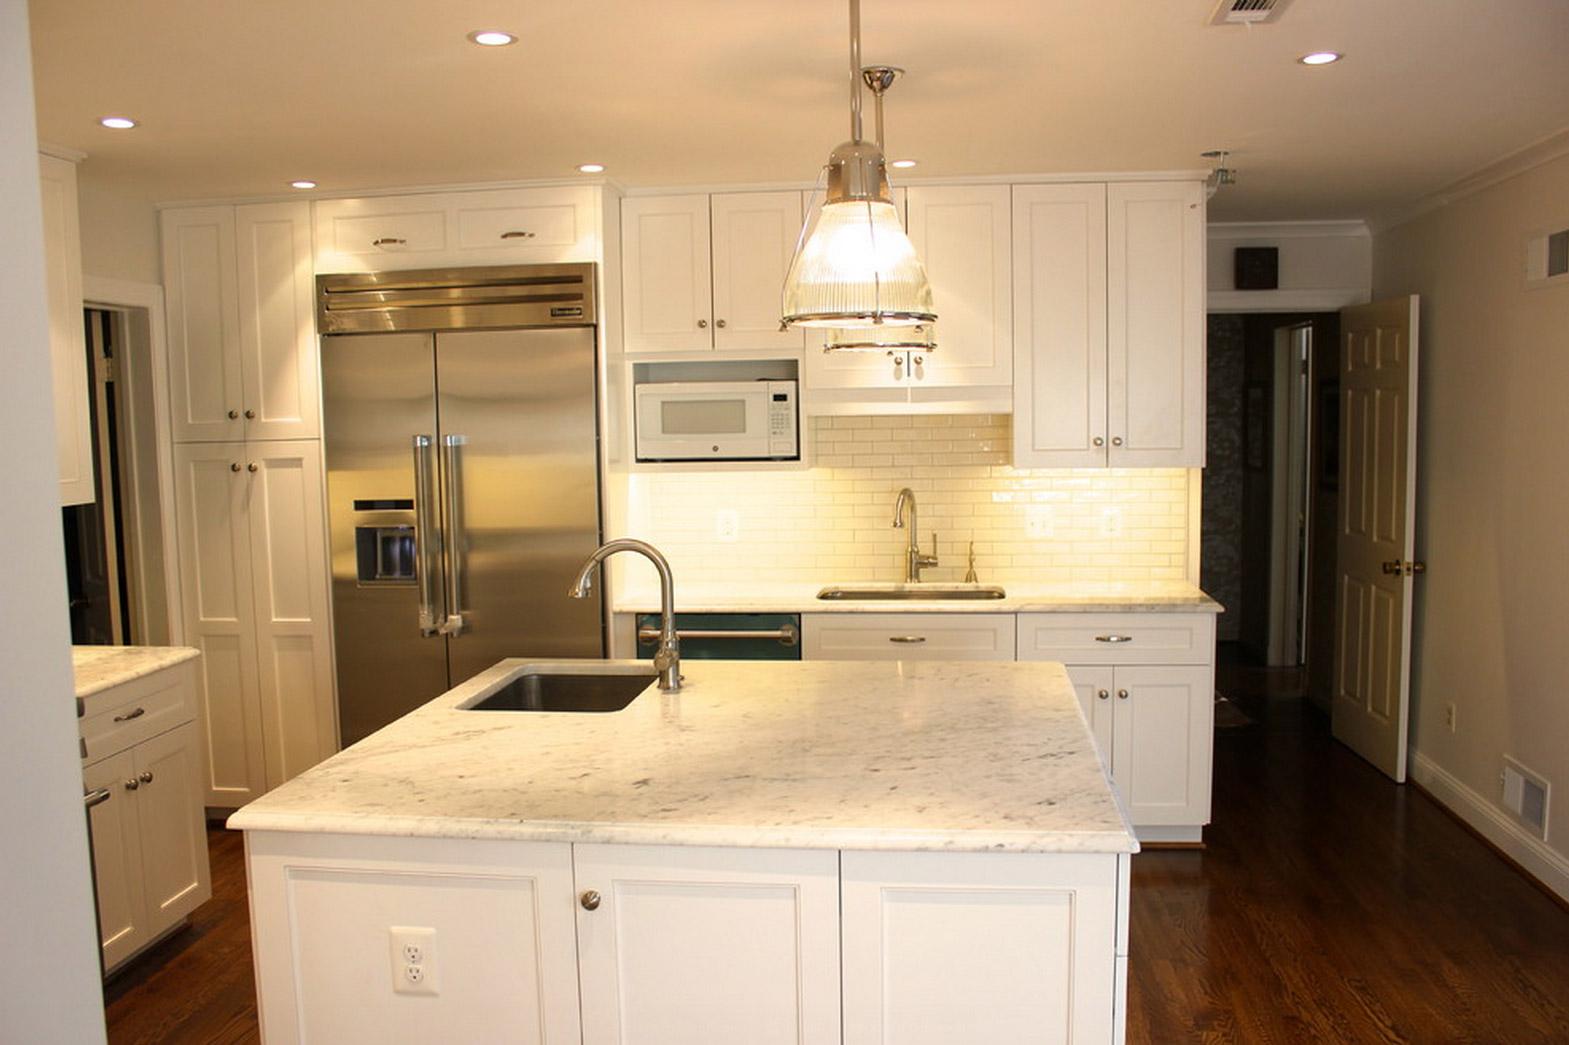 Gorgeous Kitchen Renovation In Potomac Maryland: Potomac MD Kitchen Remodel Photos